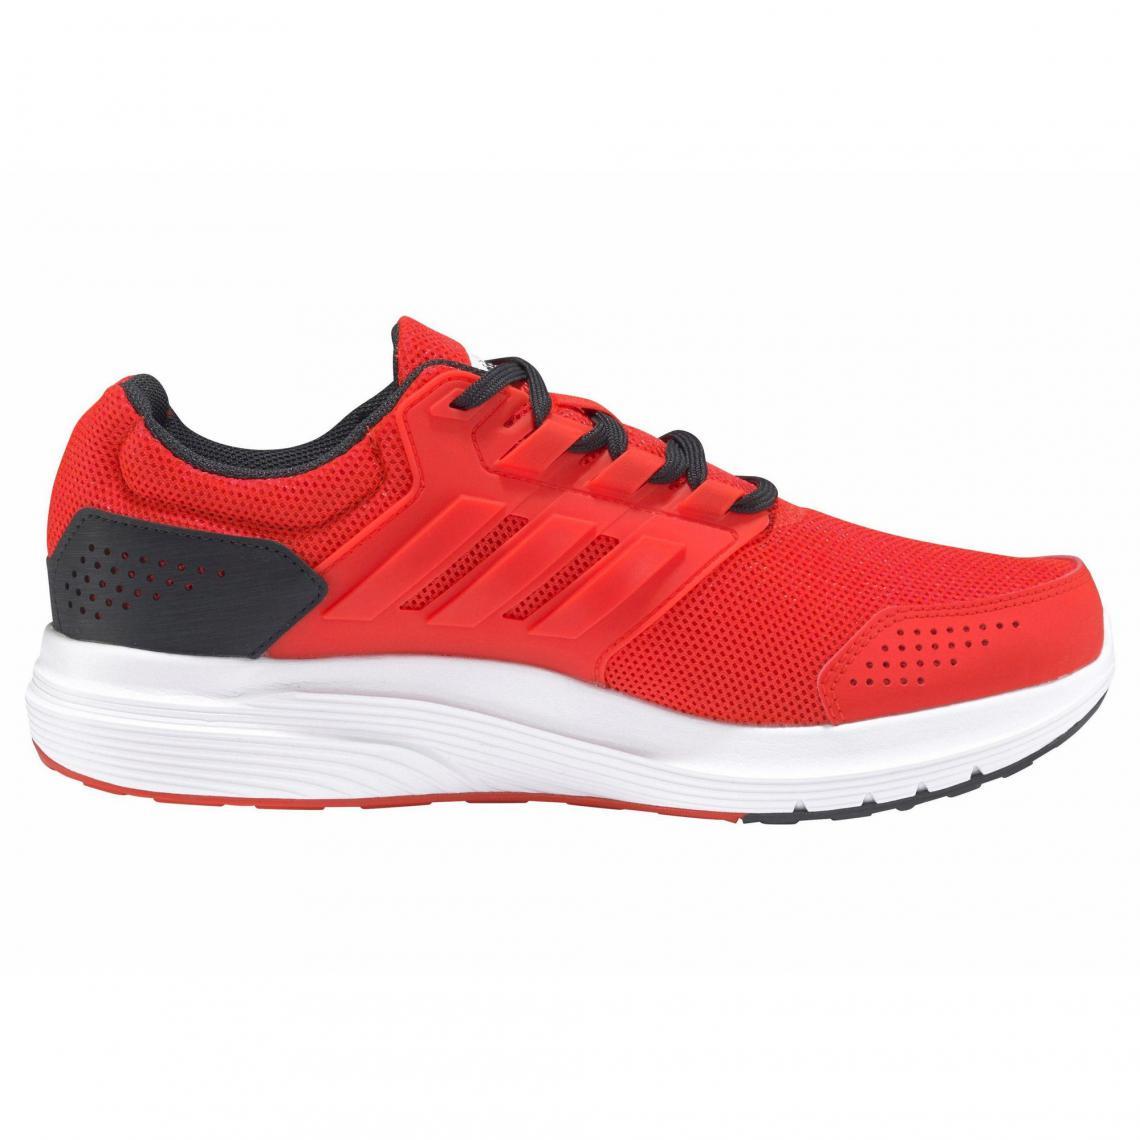 fdeebb2e826ee Baskets Adidas Cliquez l image pour l agrandir. adidas Performance Galaxy 4  chaussures de running homme - bleu foncé Adidas